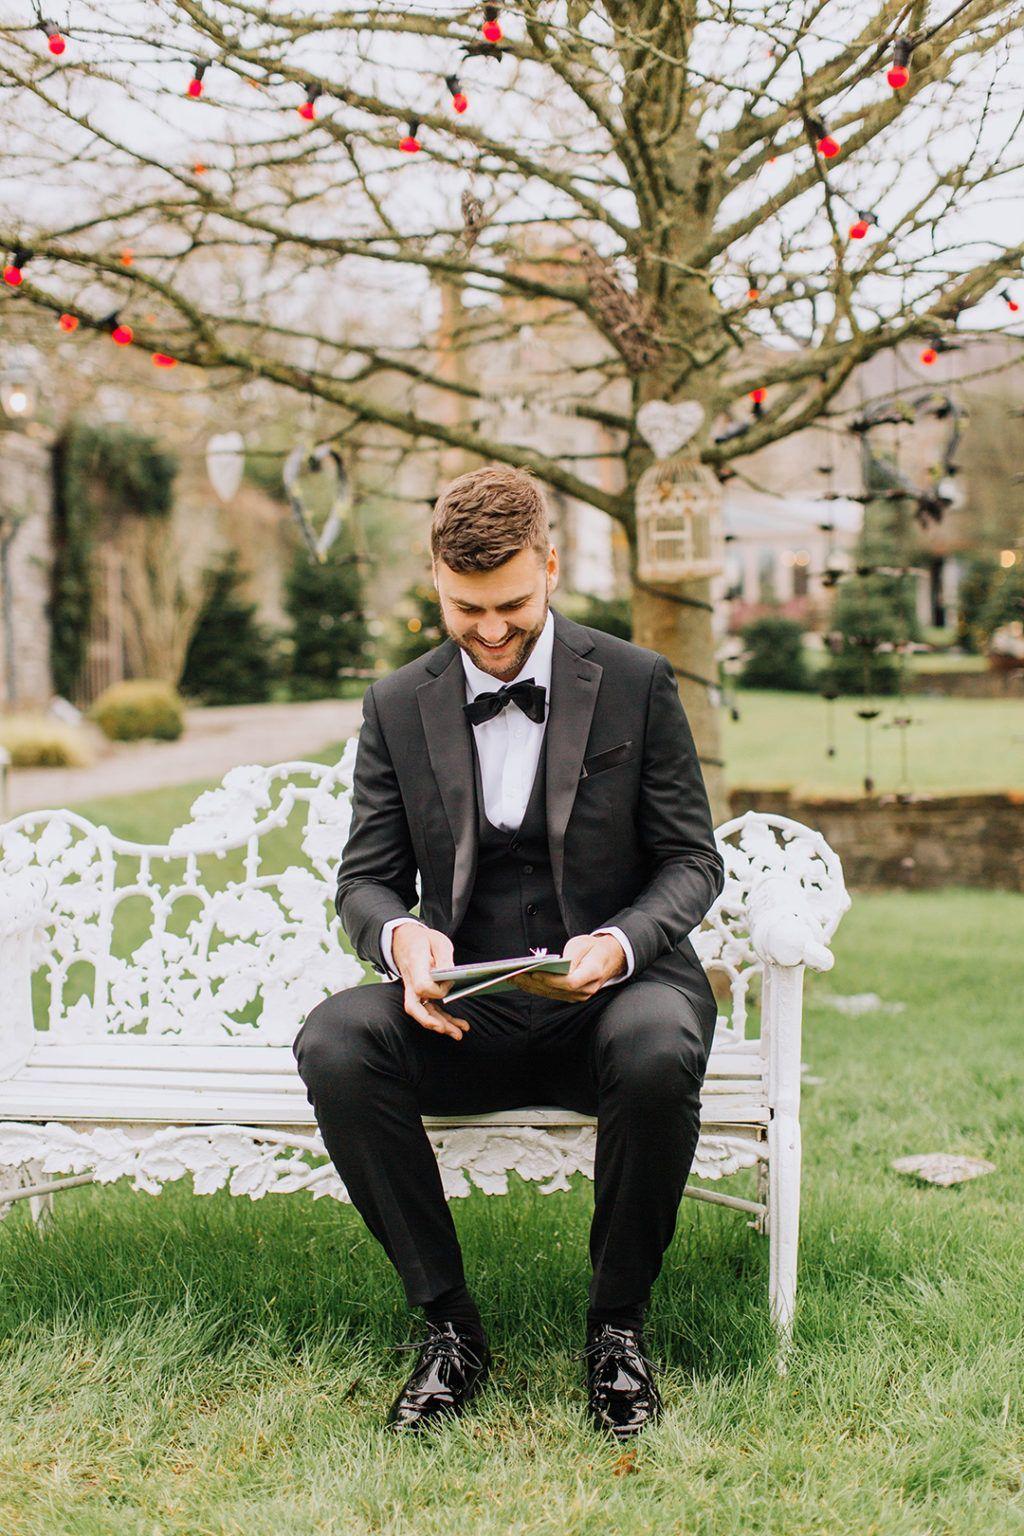 From Australia To Ballymagarvey A Perfect Christmas Wedding Onefabday Com Ireland In 2020 Groom Style Christmas Wedding Wedding